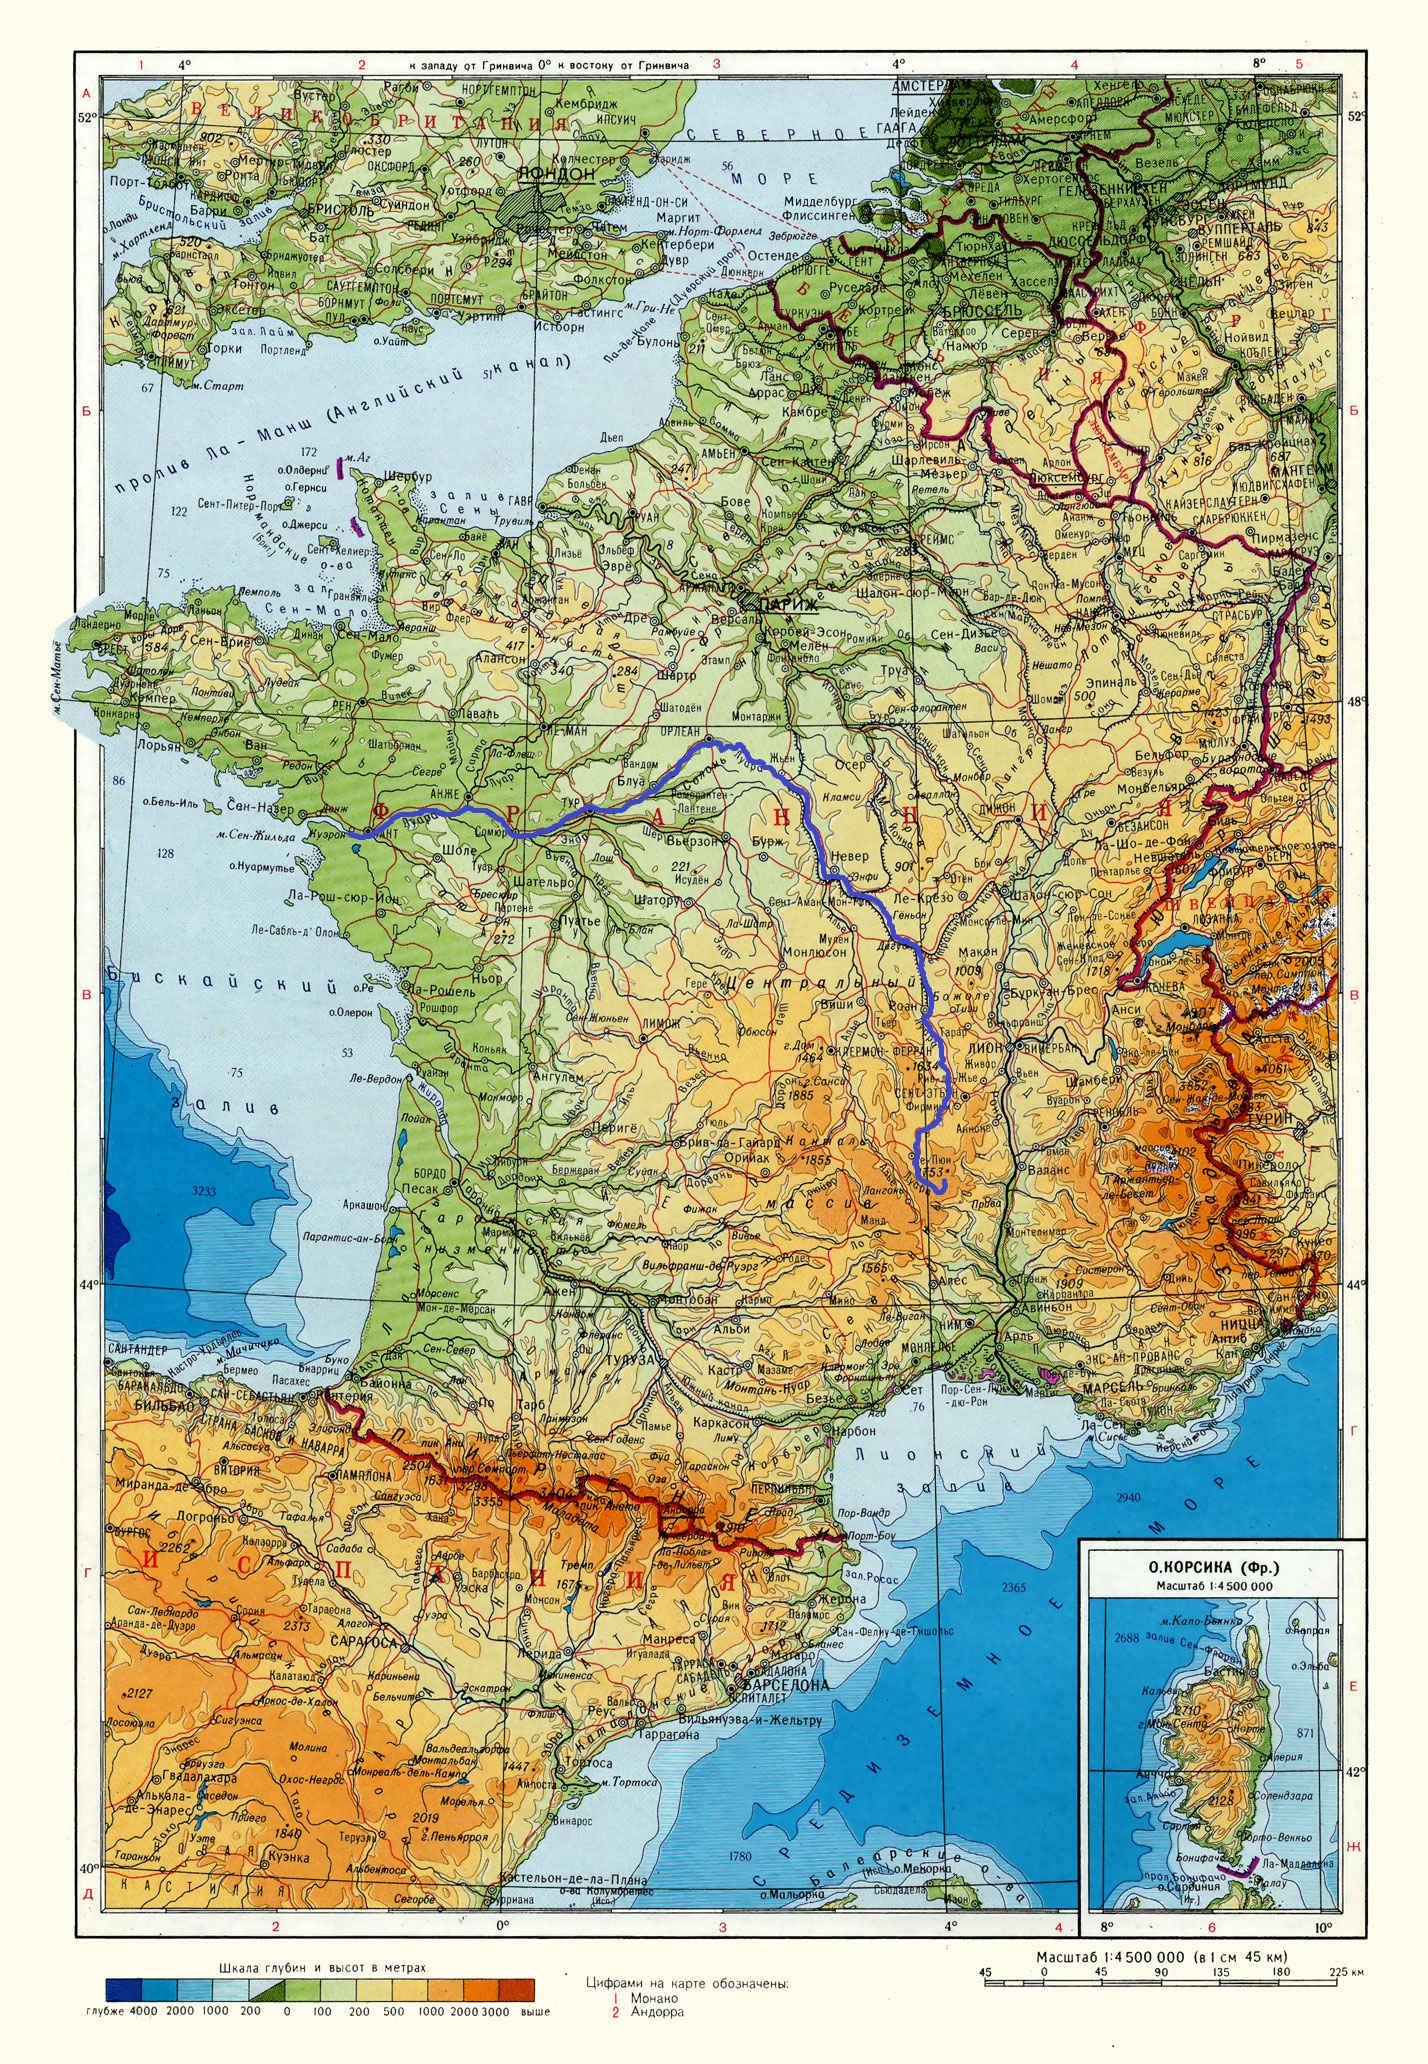 Река Луара (Loire) на карте